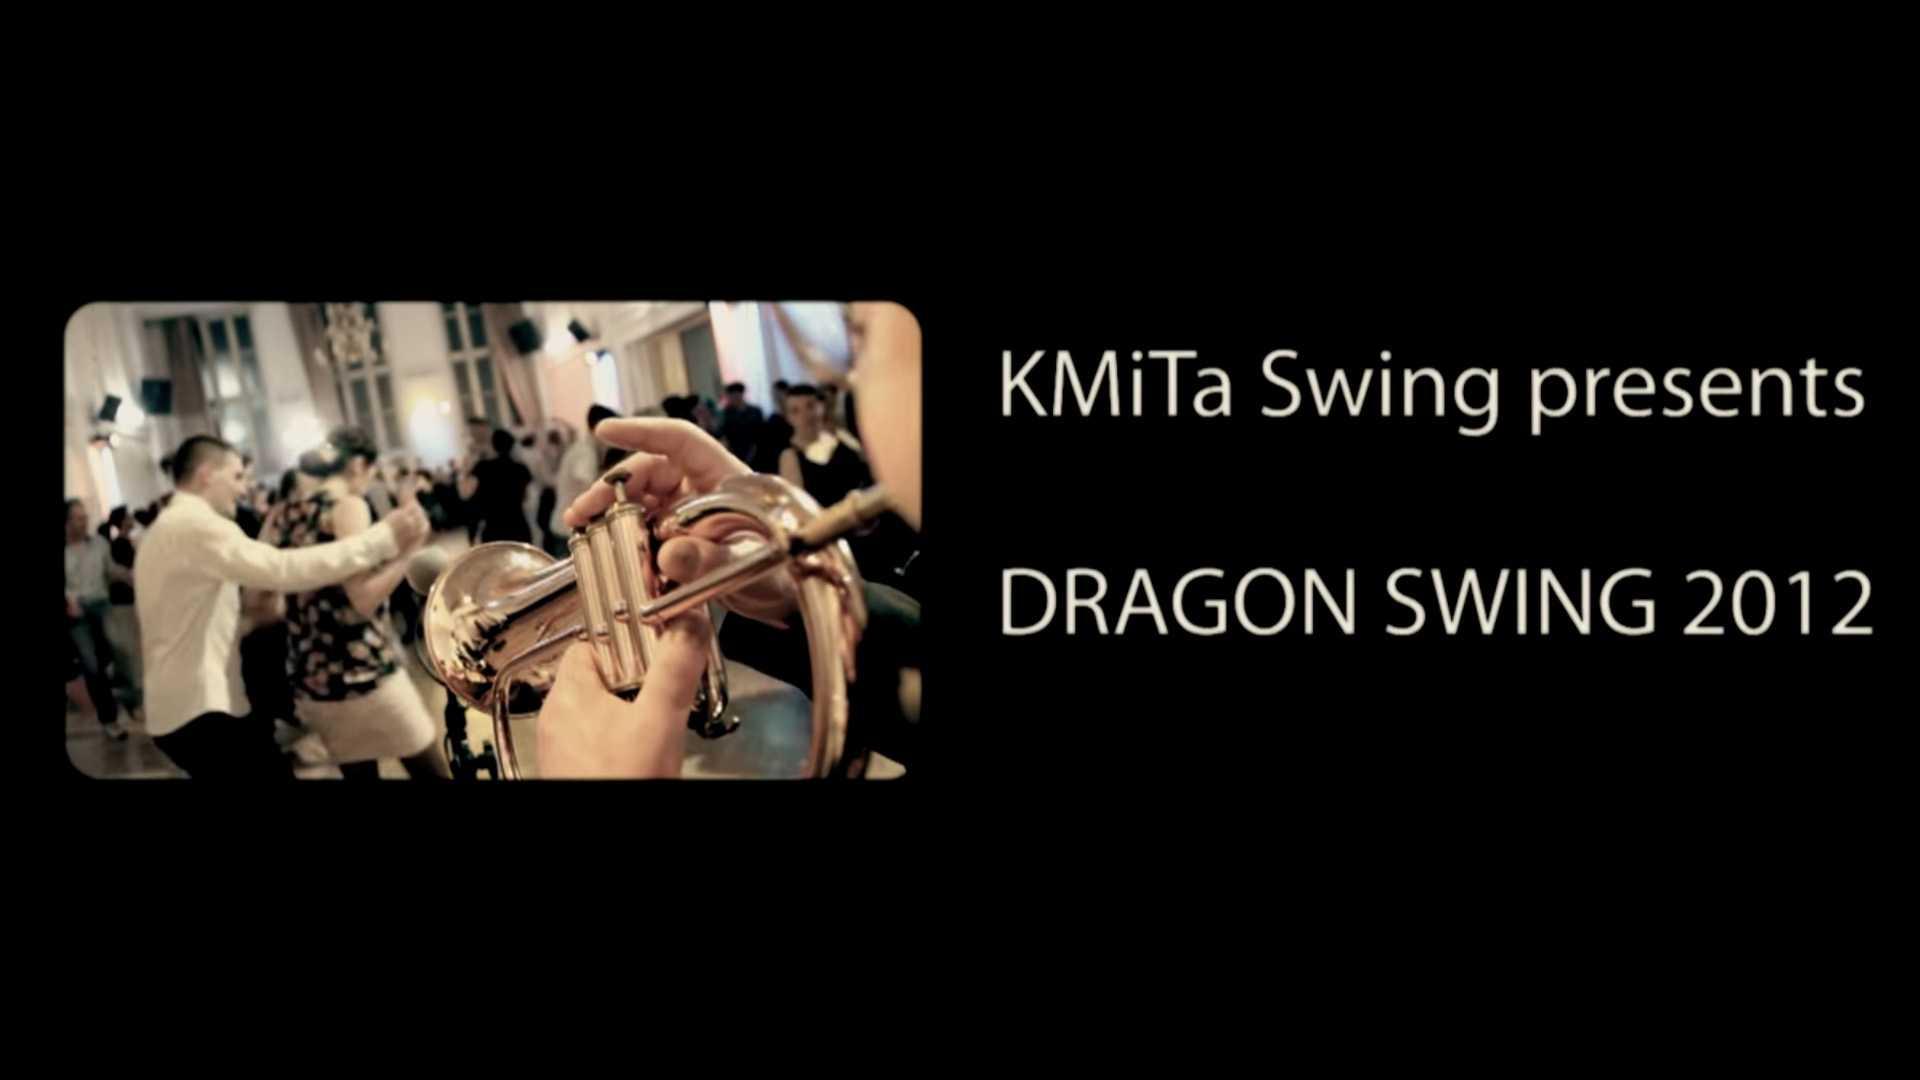 DRAGON SWING 2012 (short version)